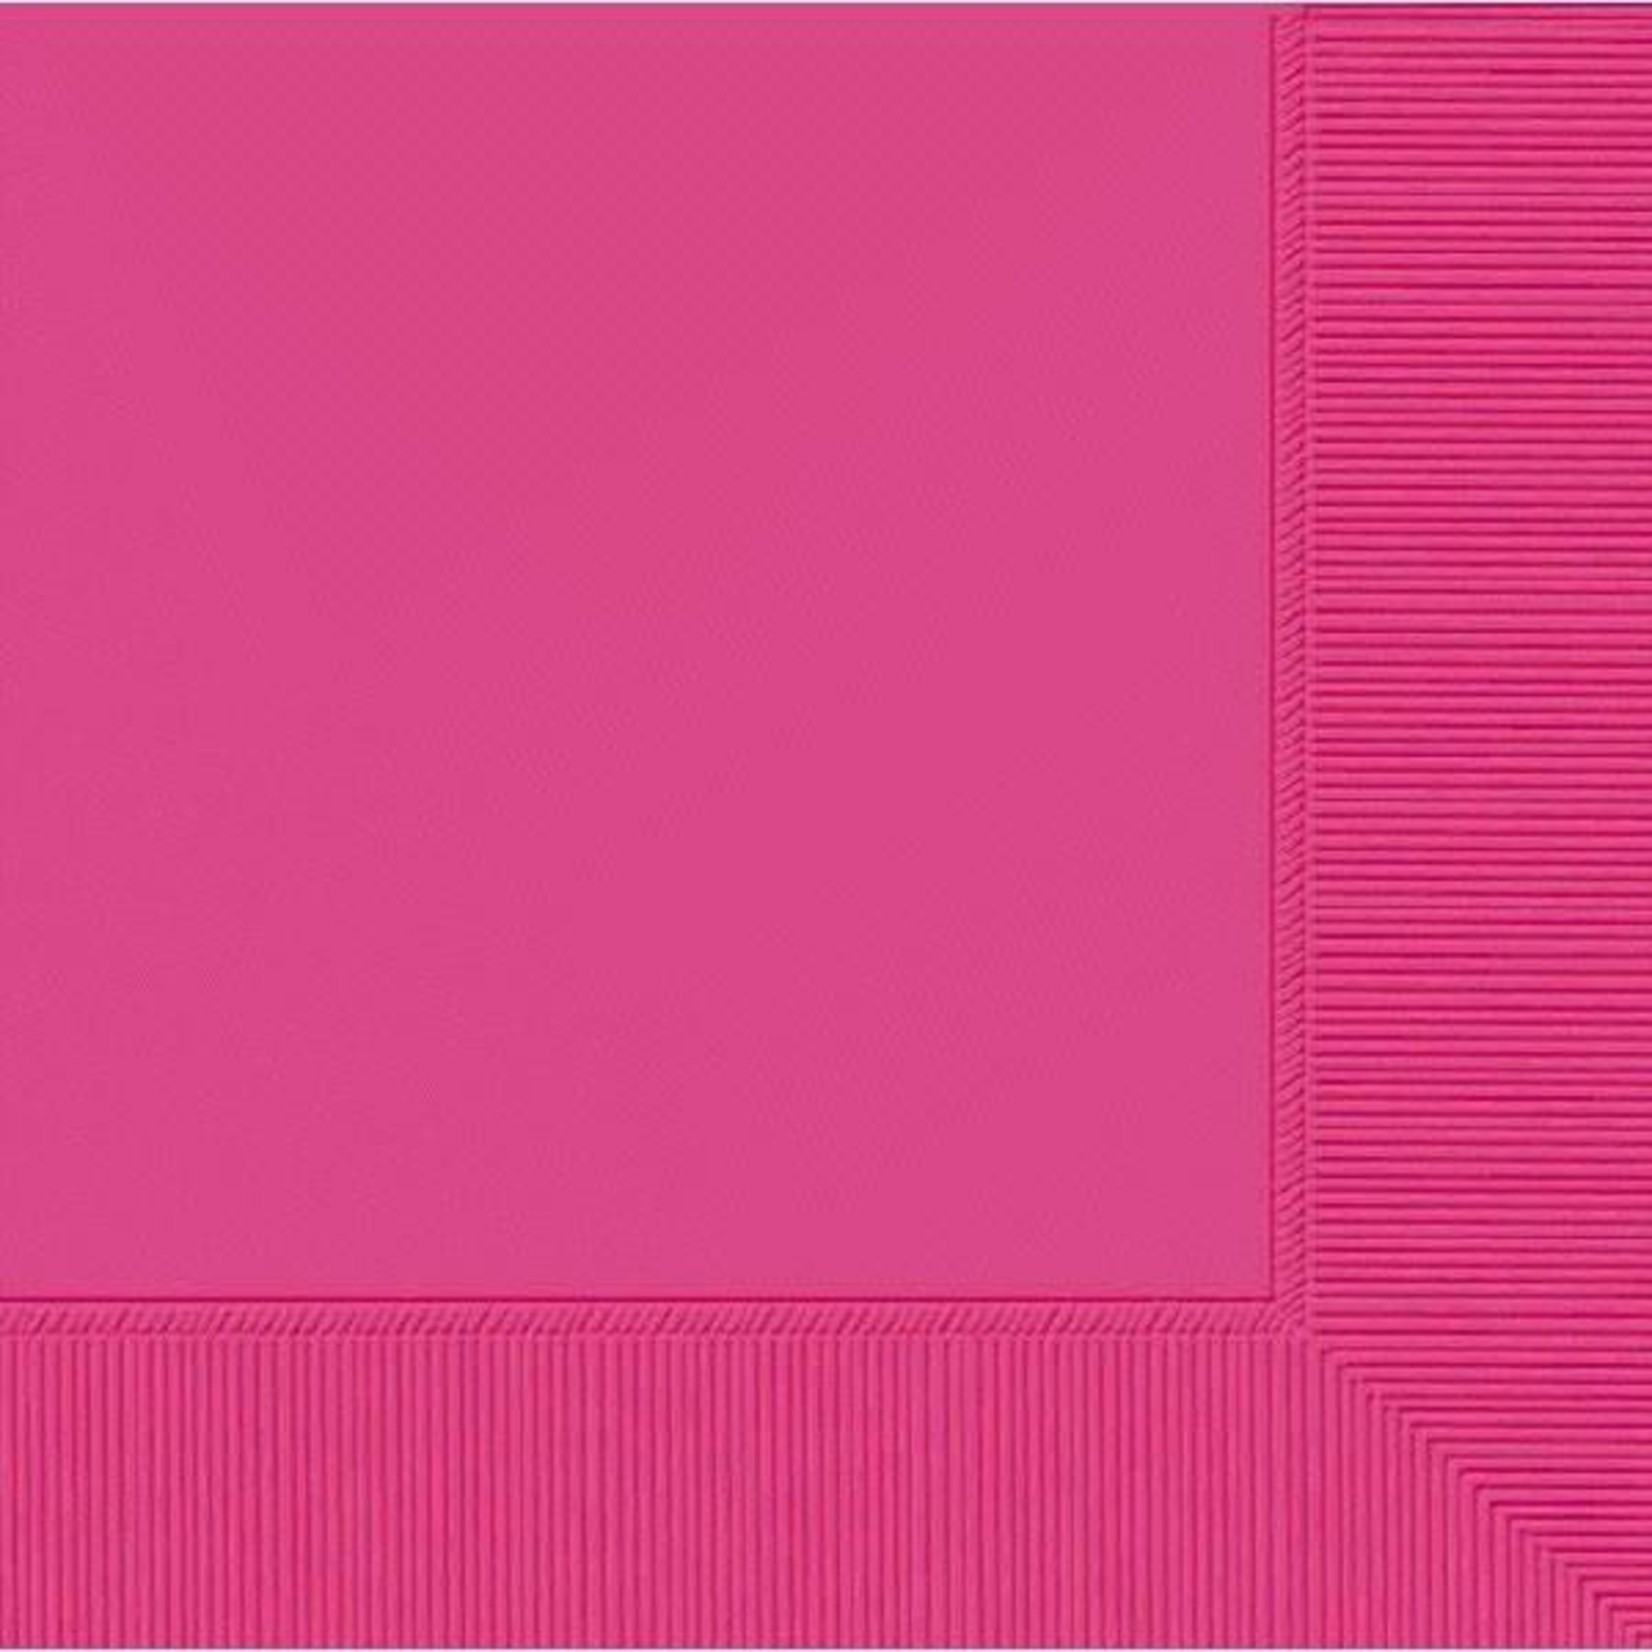 Amscan SERVIETTES COCKTAIL - ROSE ECLATANT (50)